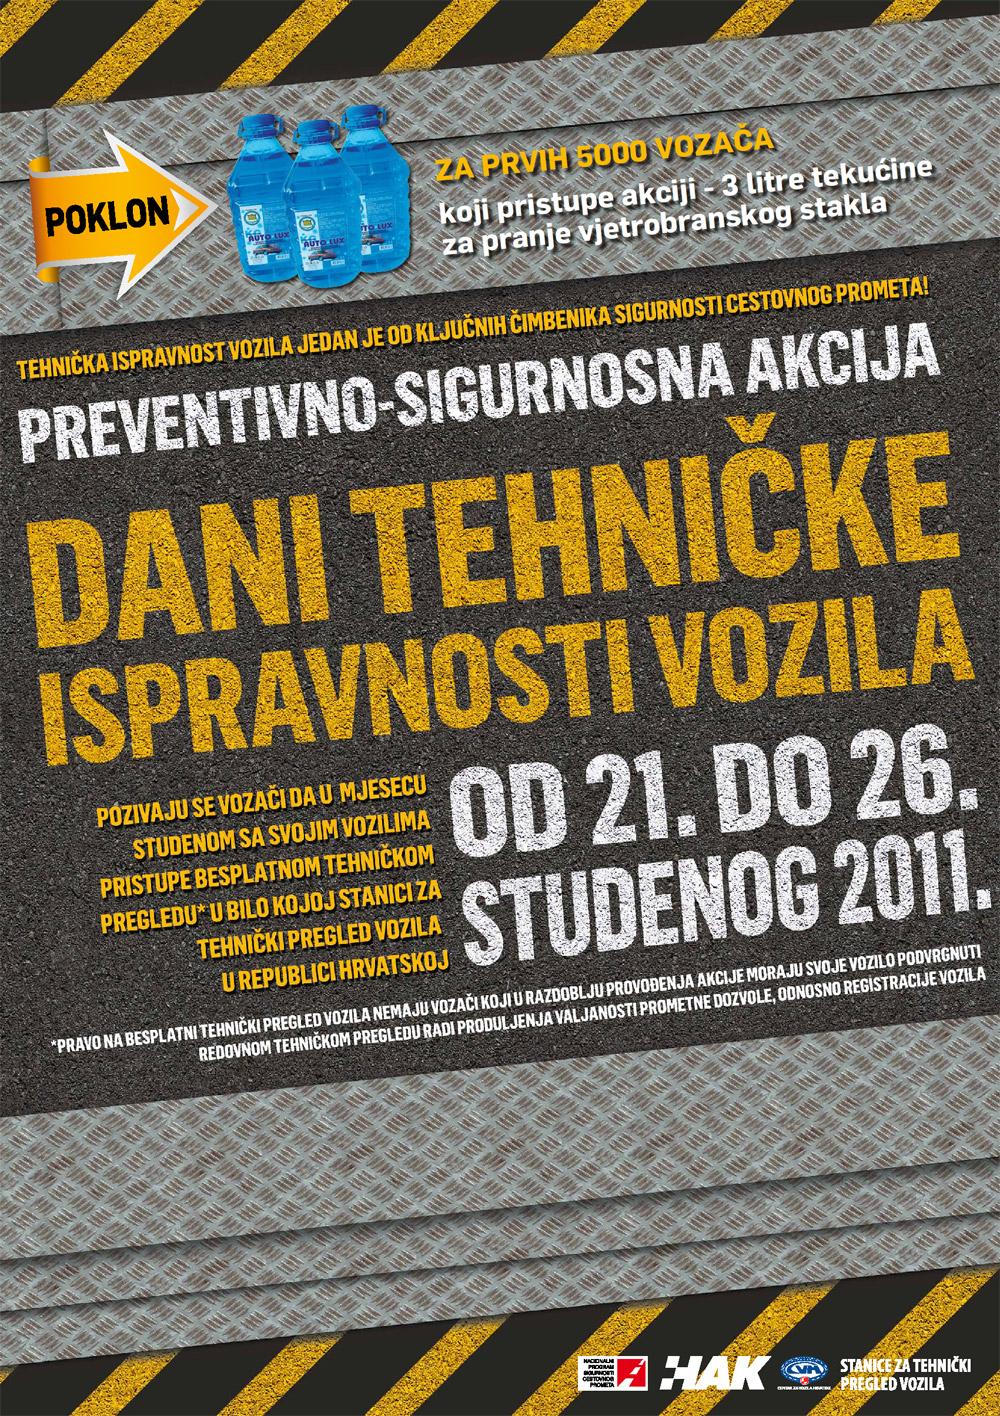 "Plakat ""Dani tehničke ispravnosti vozila"""